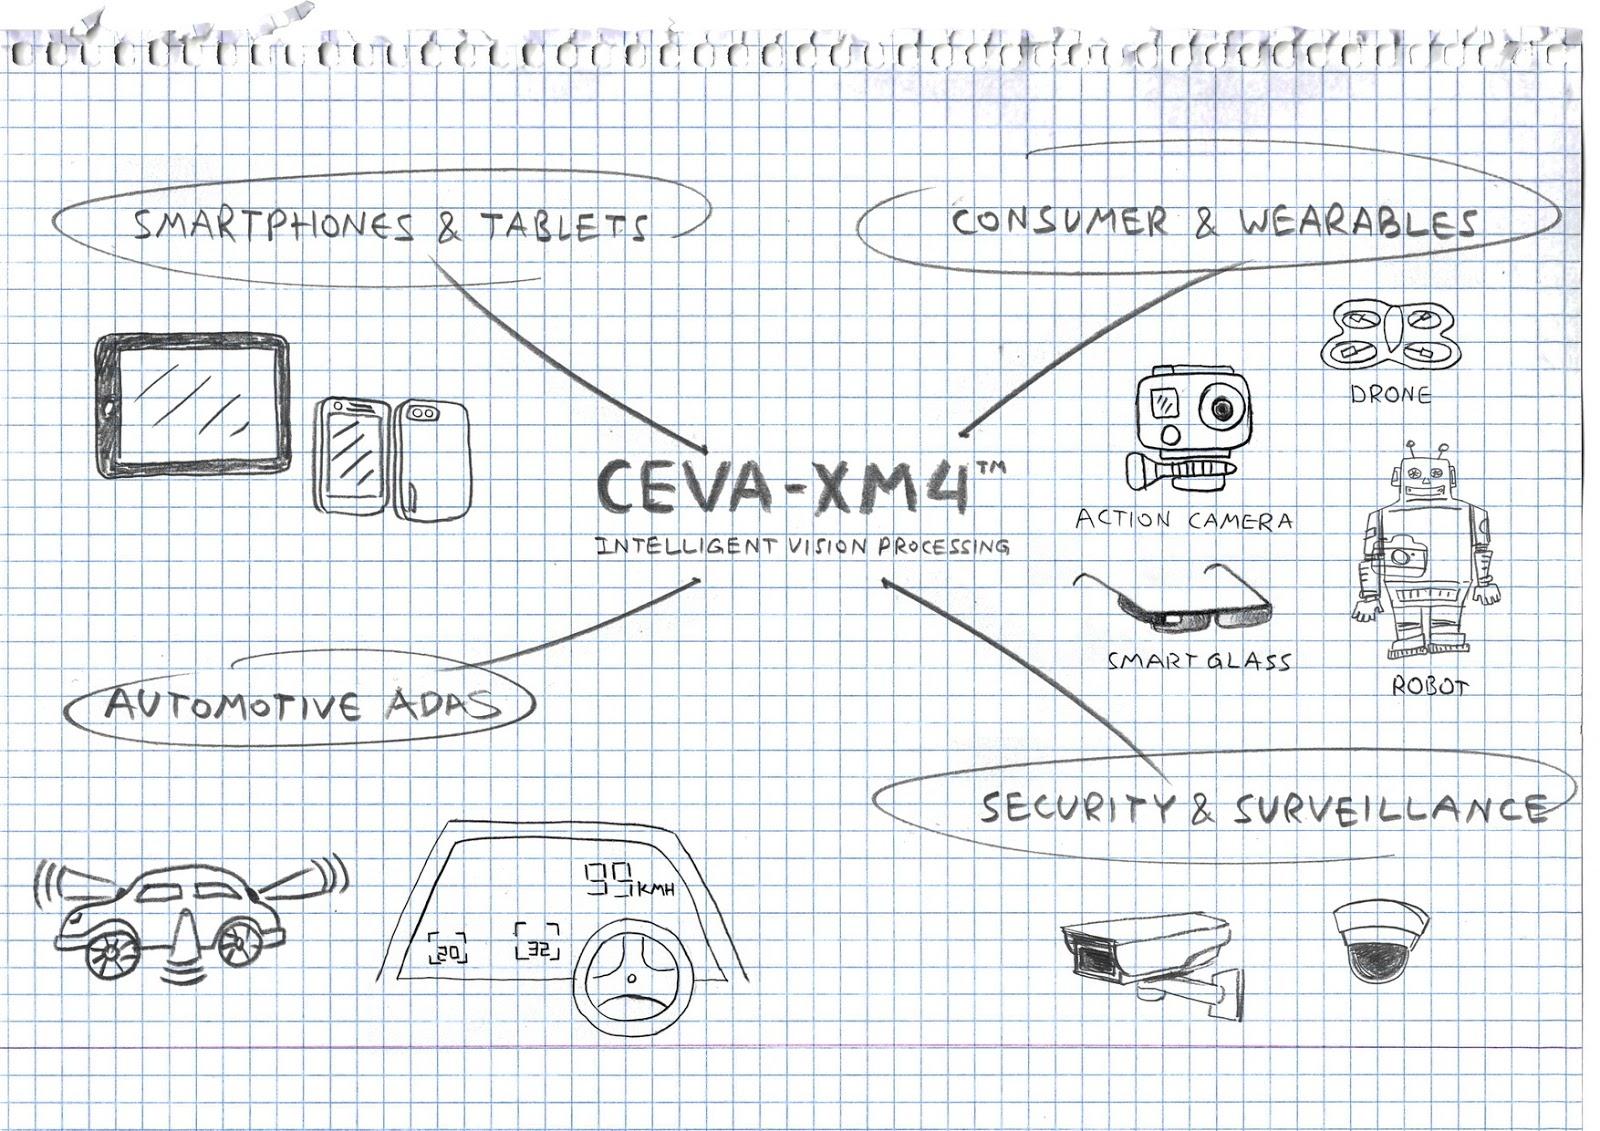 The Intelligent Computer Vision Processor Ceva Xm4